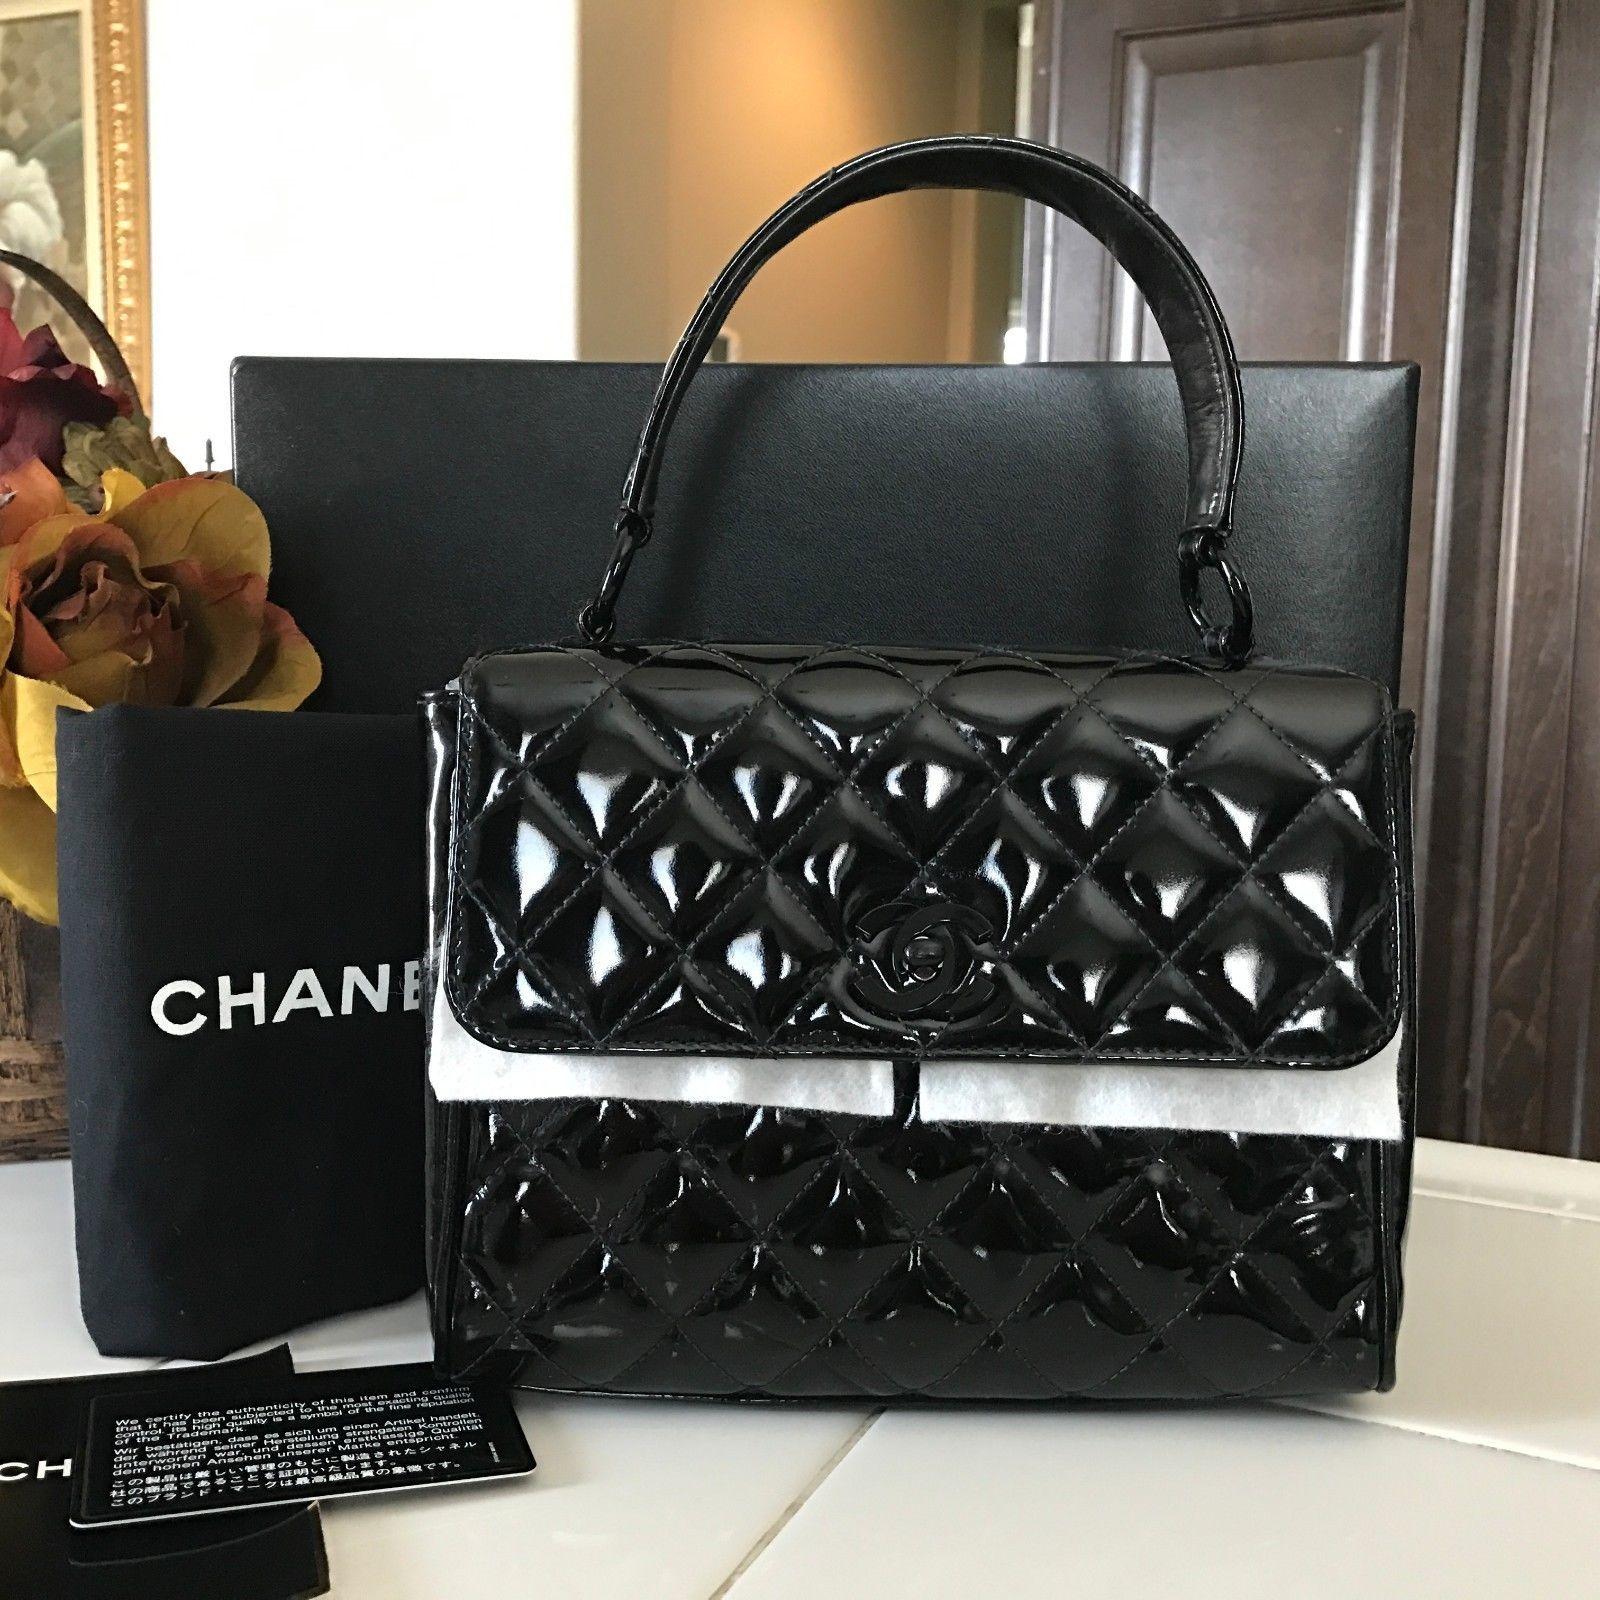 67d9ef29437d Vintage chanel | Vintage Chanel | Chanel, Vintage chanel, Chanel ...